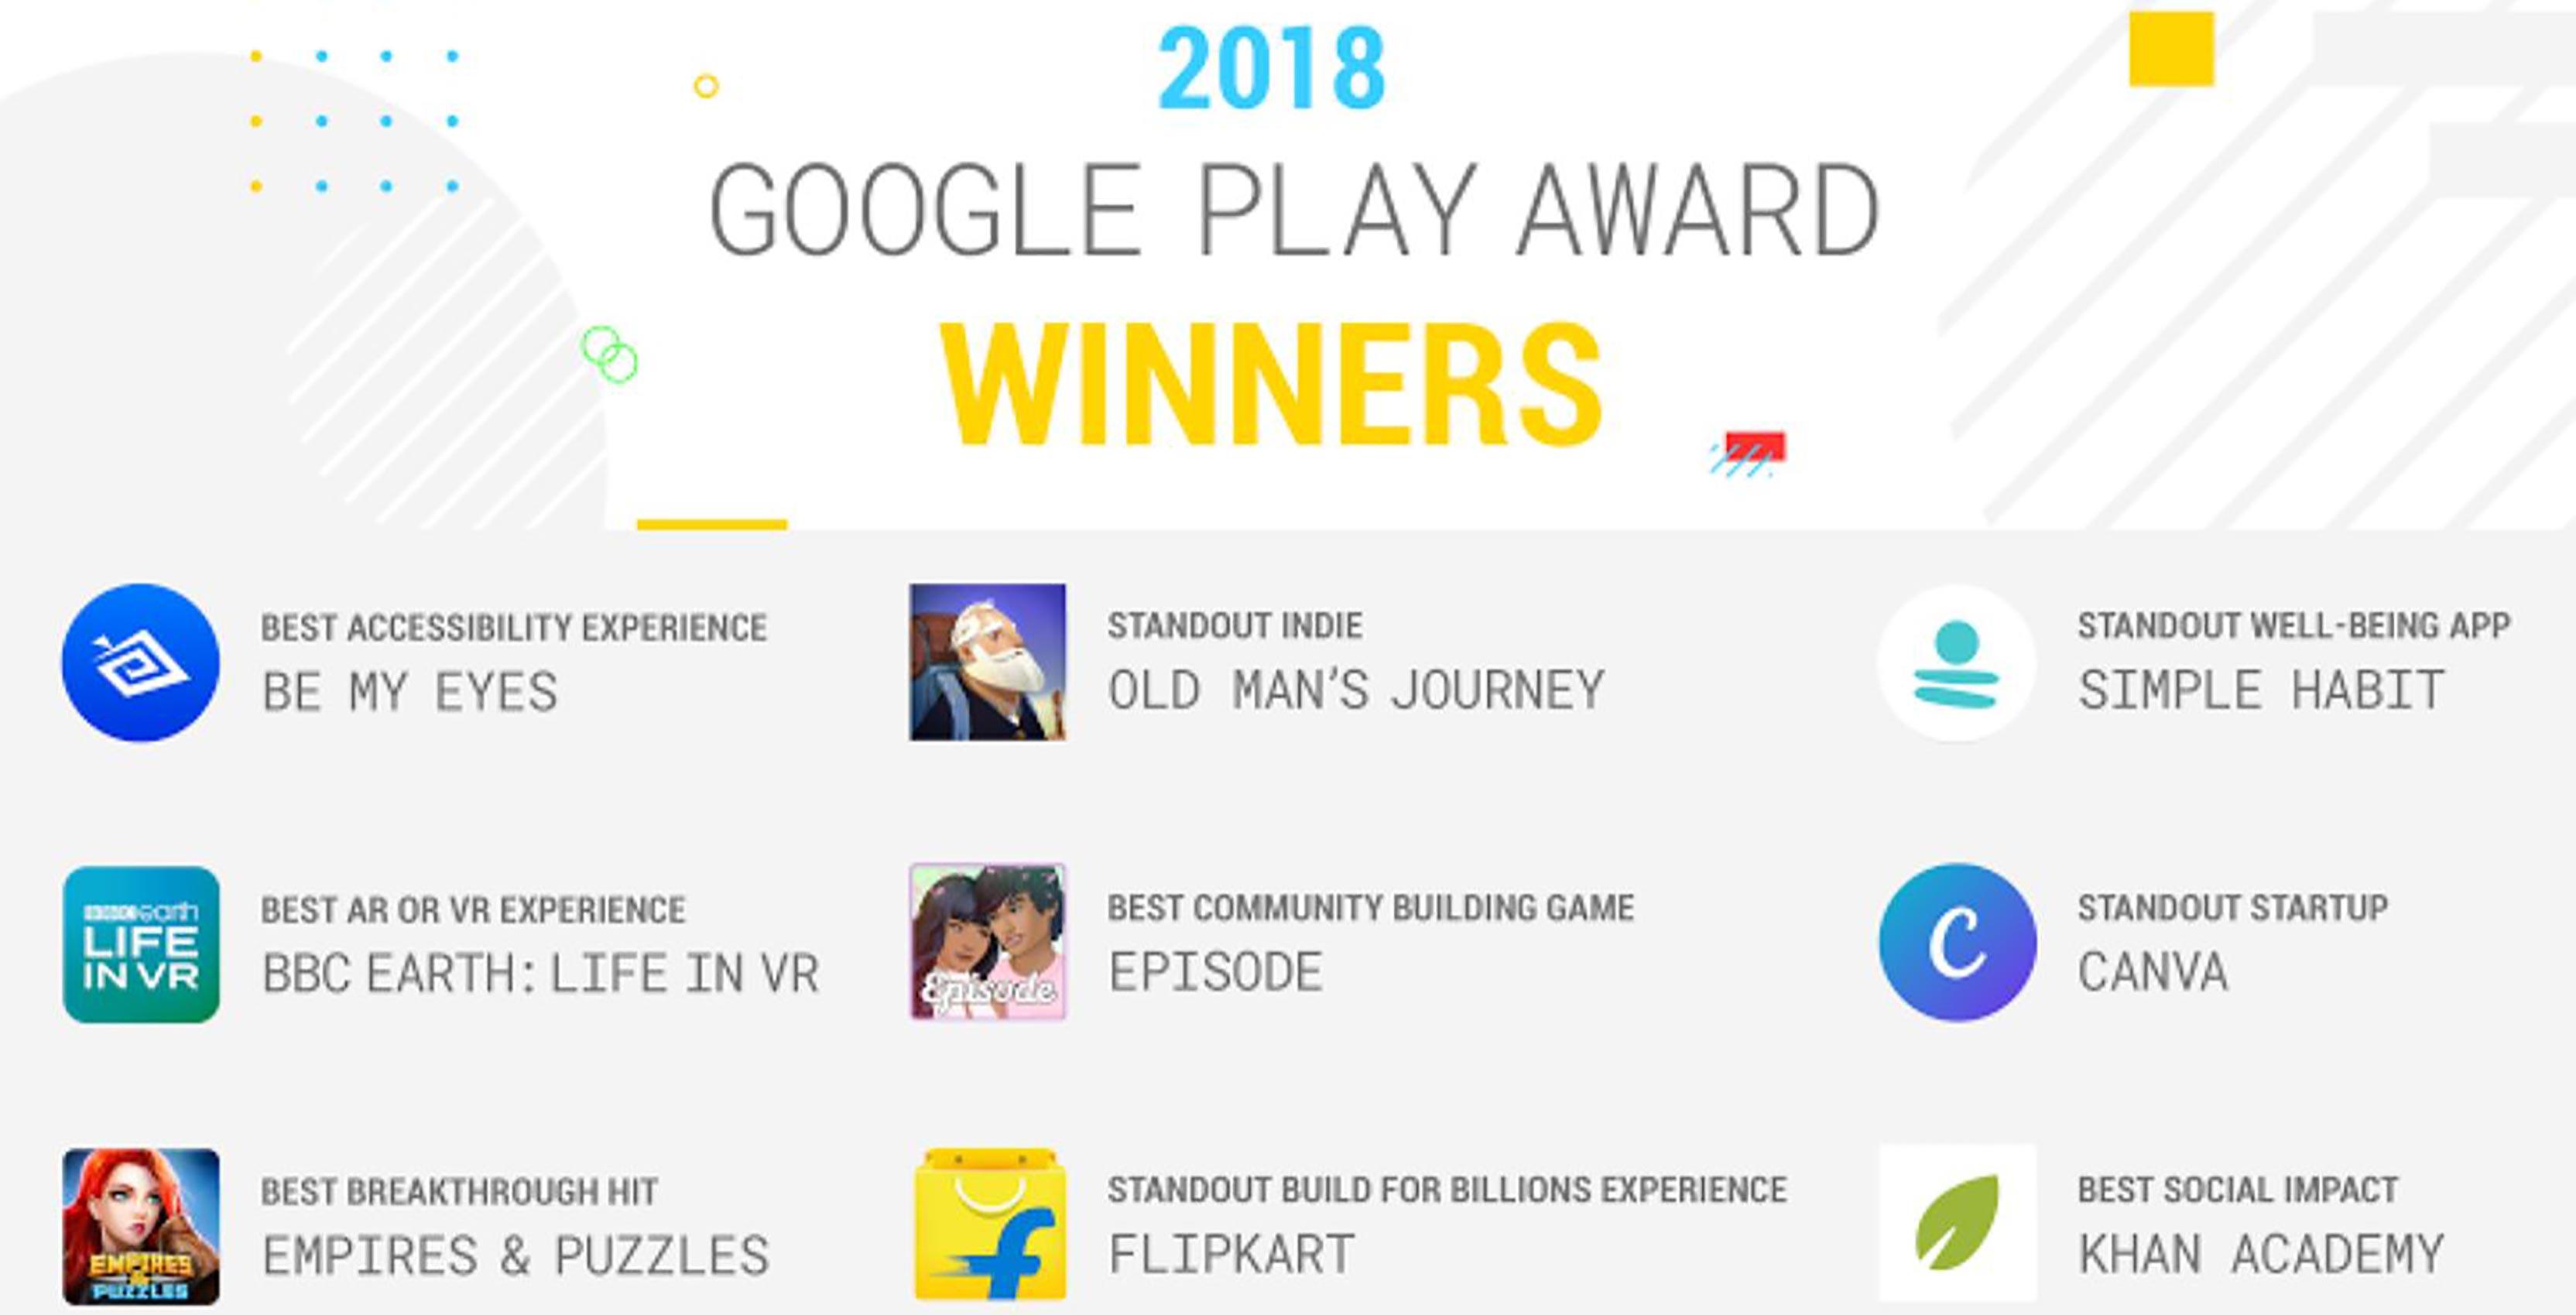 Google Play Award